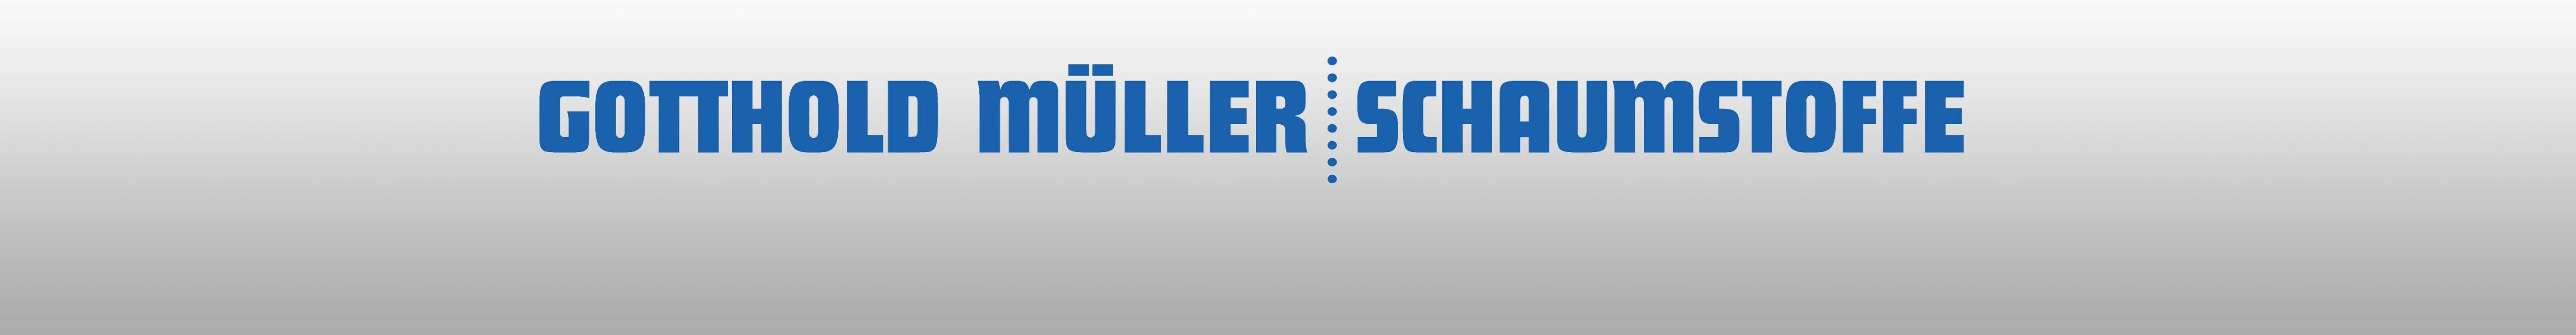 Müller Schaumstoffe Logo